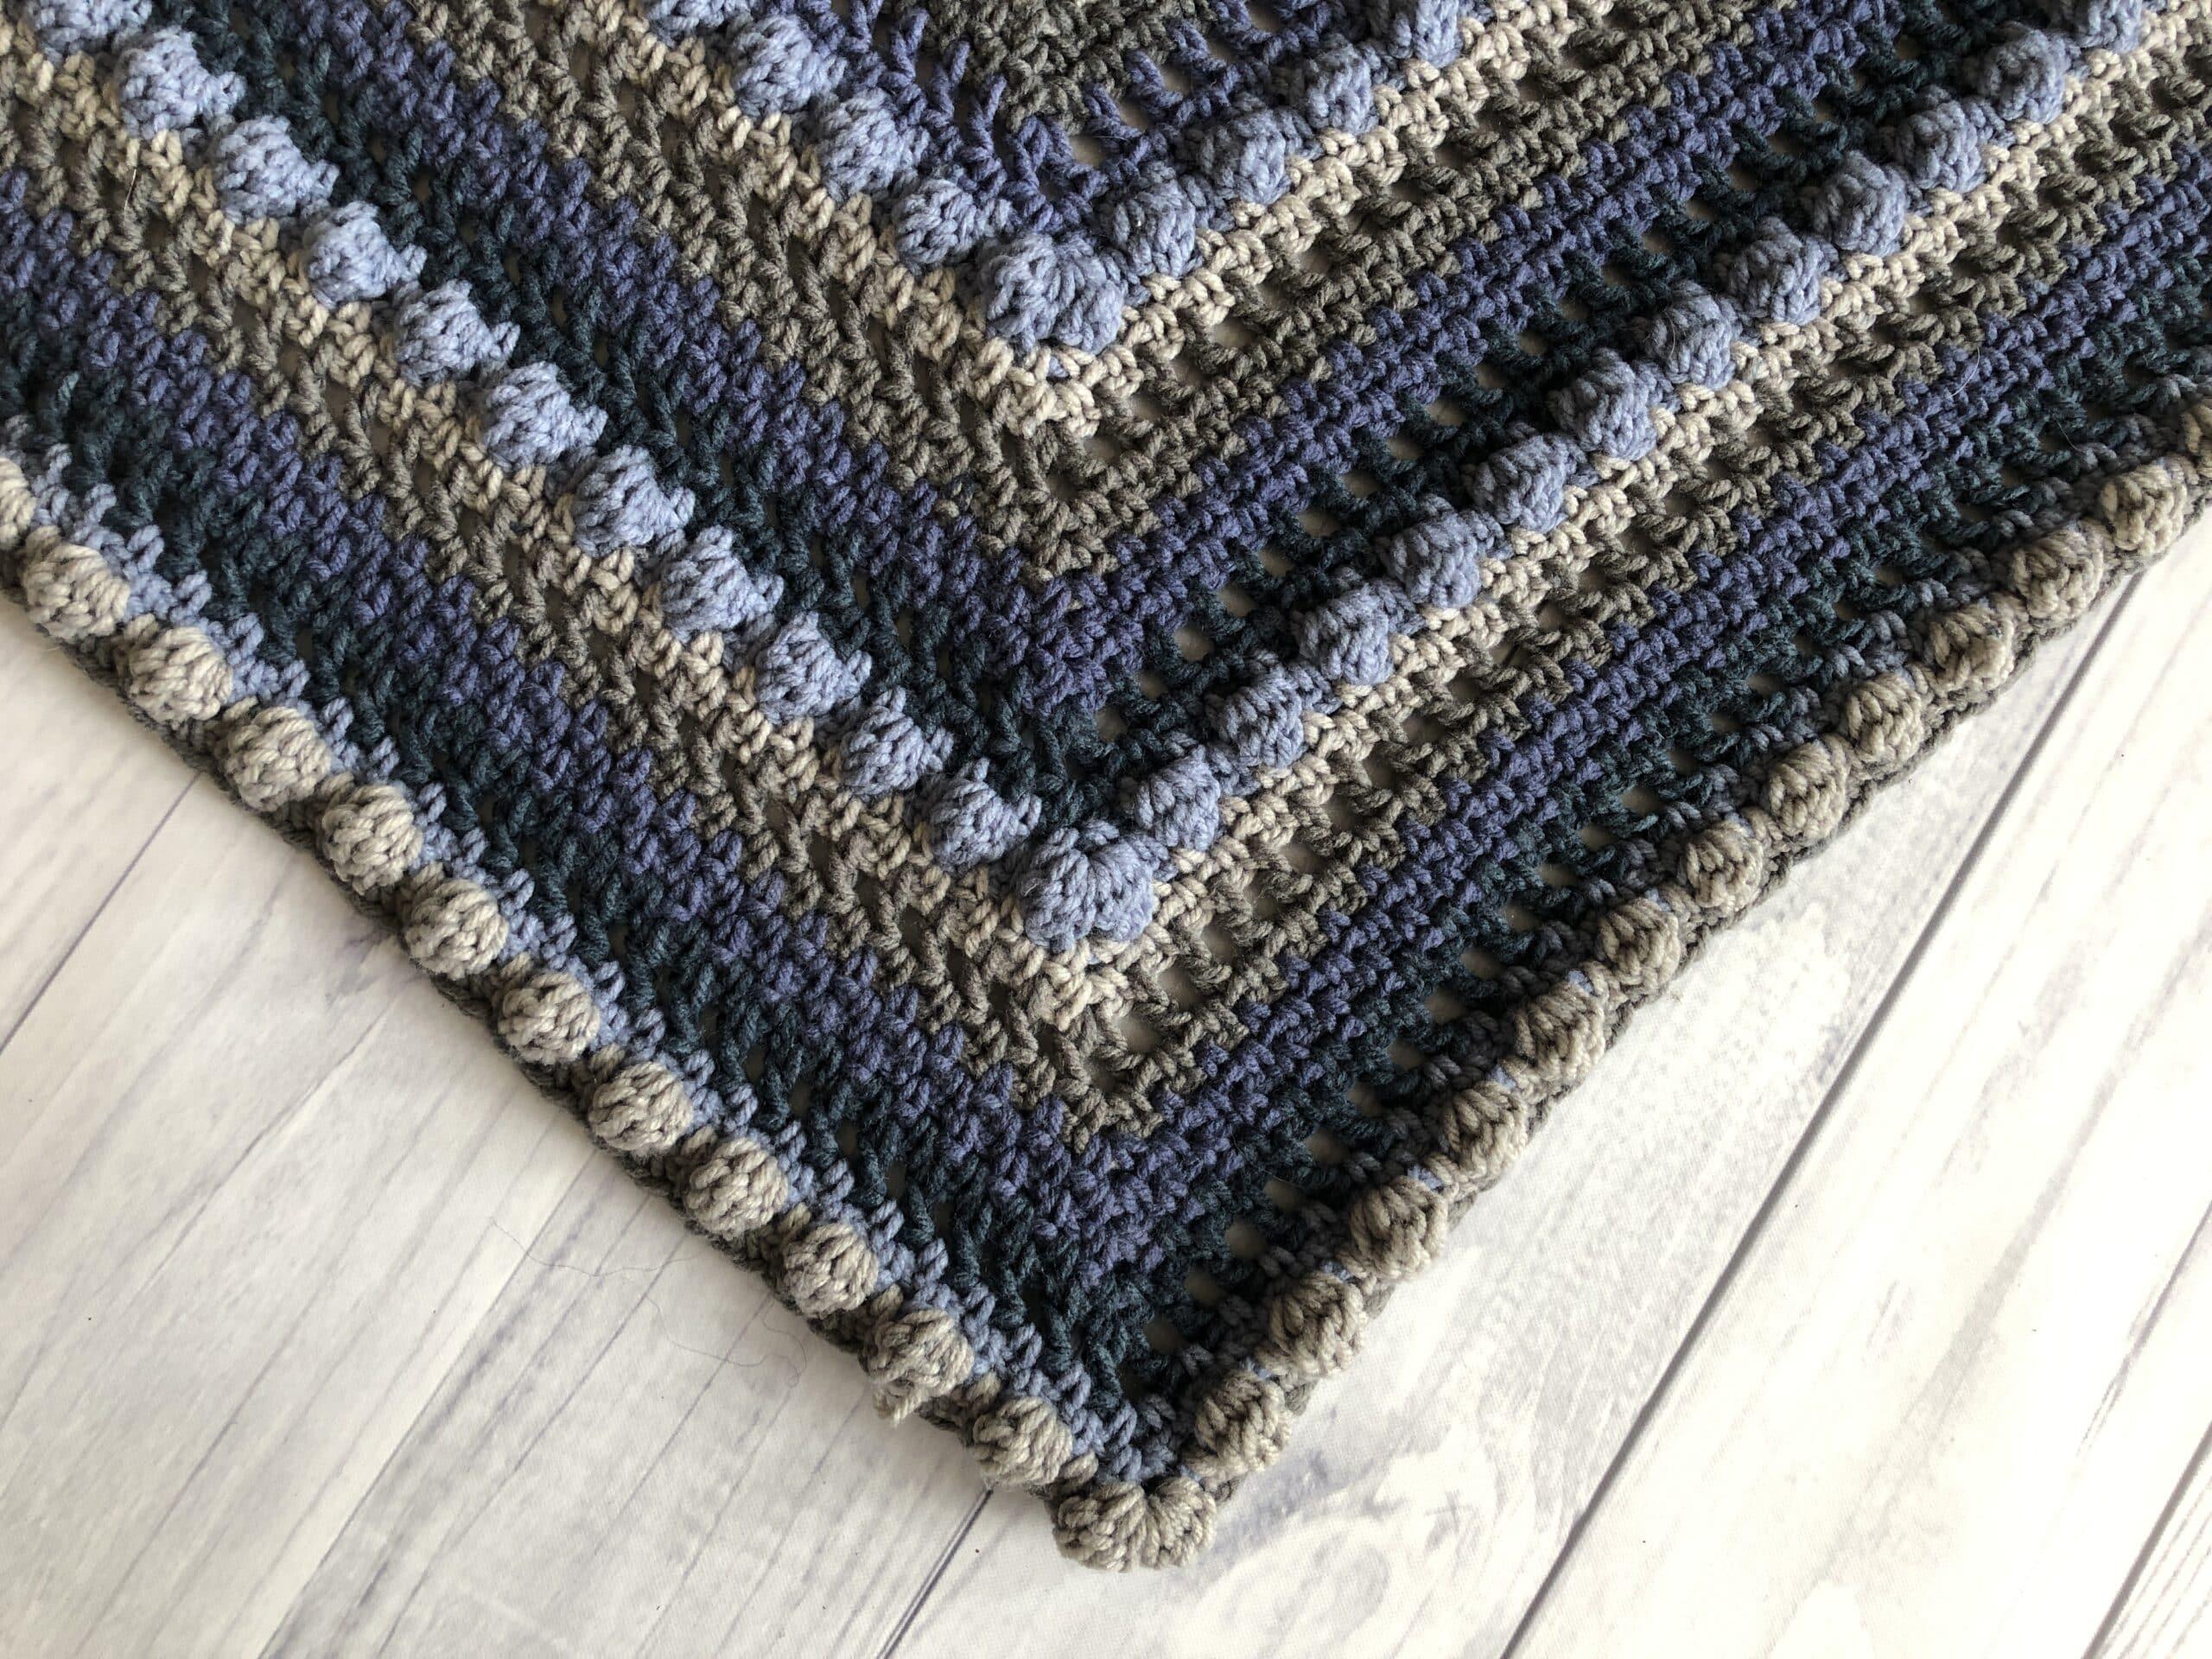 Crochet Triangle Shawl2